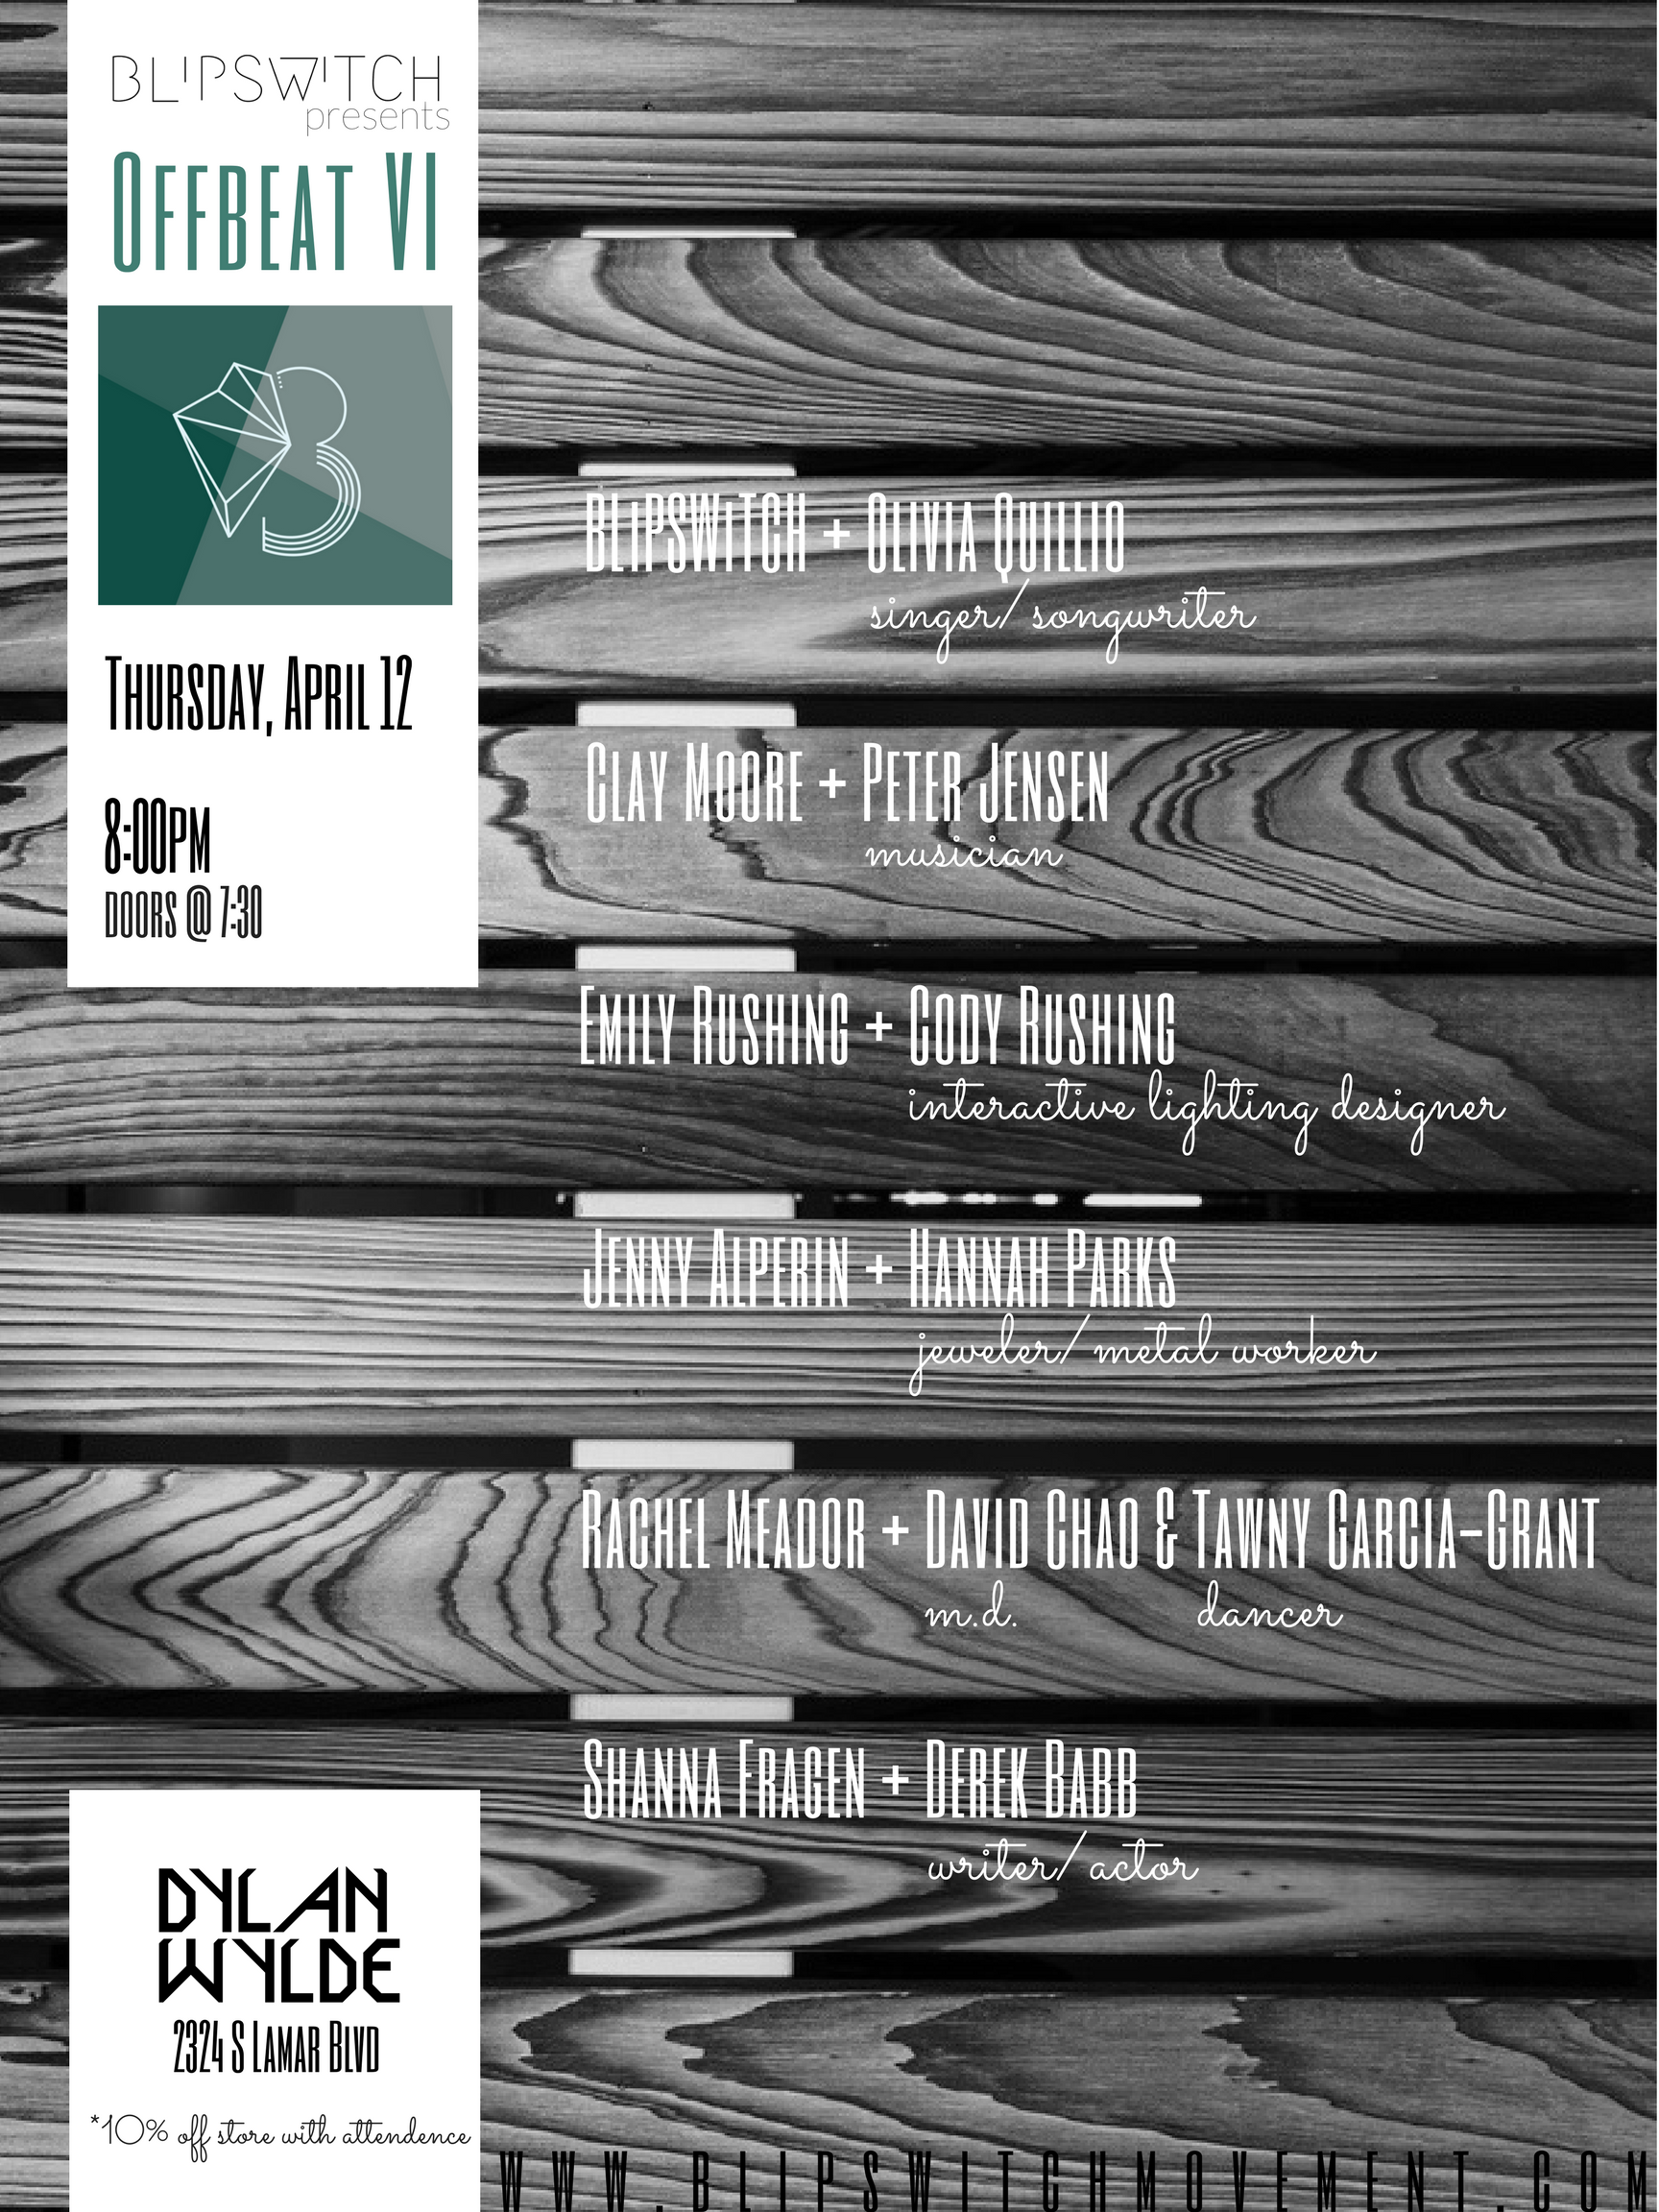 BLiPSWiTCH presentsOffbeat VI - April 12, 2018DYLAN WYLDE. Austin, TX